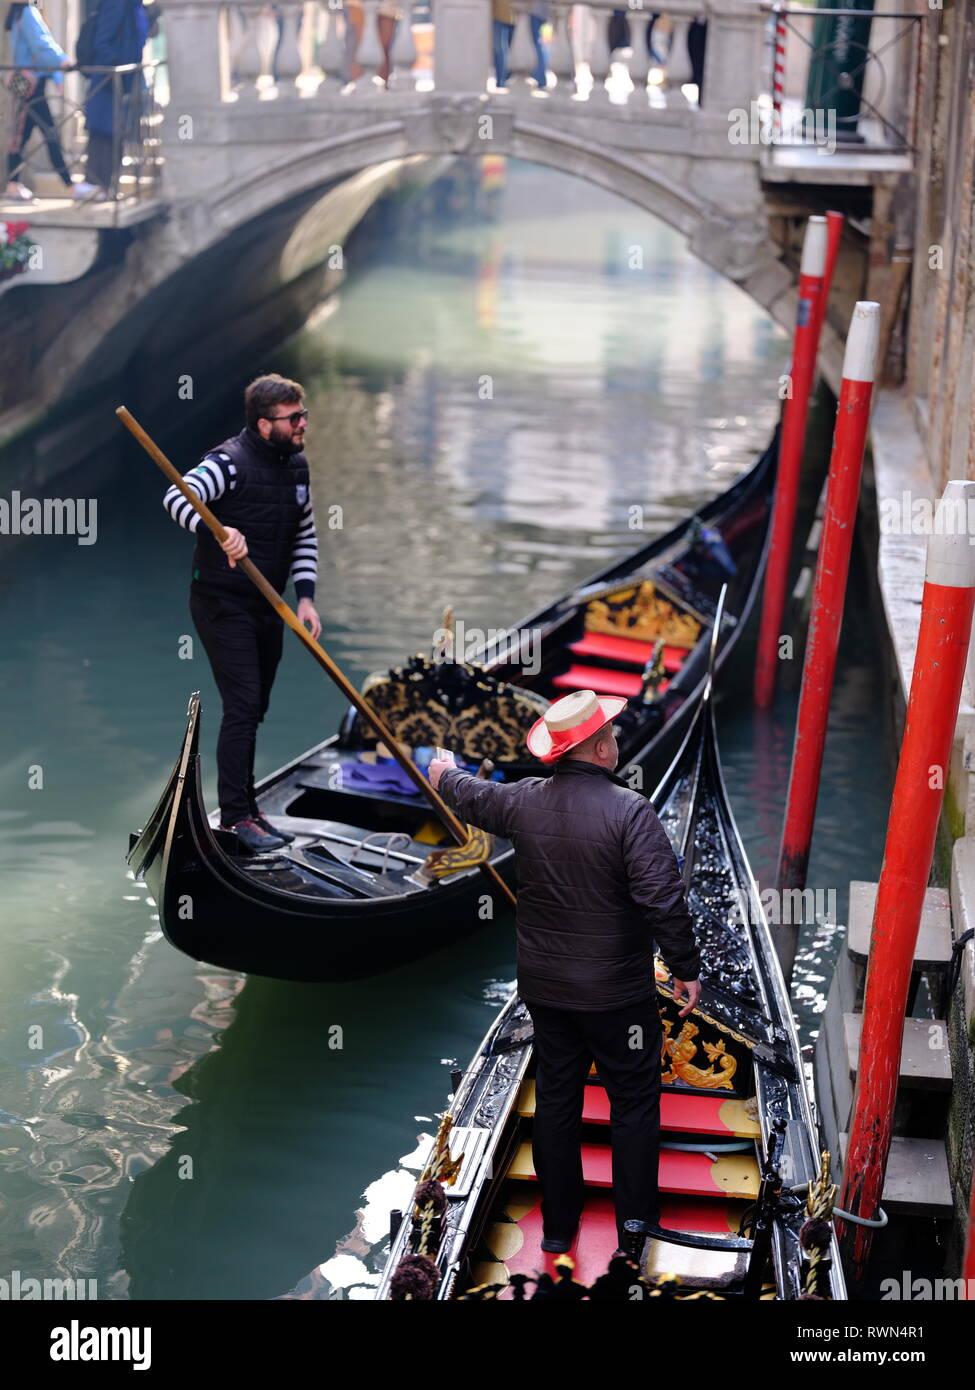 f5d63f8b970 Gondola   Gondolier Grand Canal Venice Italy Flat bottomed venetian rowing  boat - Stock Image